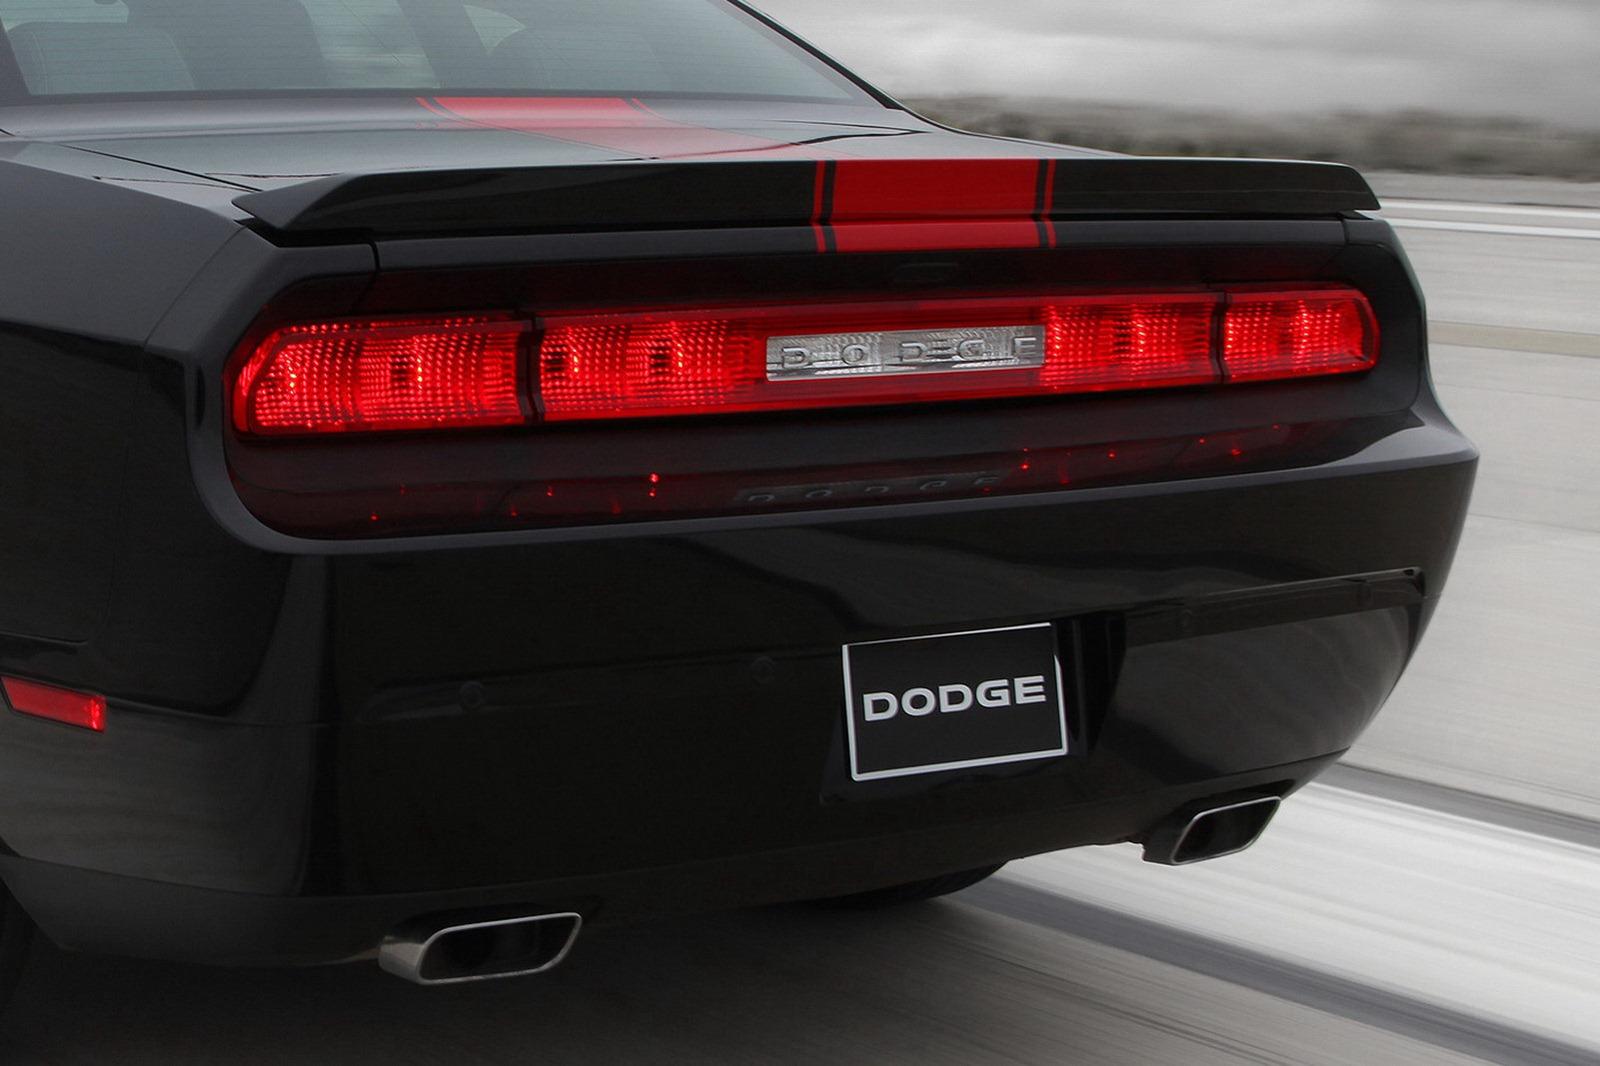 2013 Charger Gear Shift Stuck Autos Post